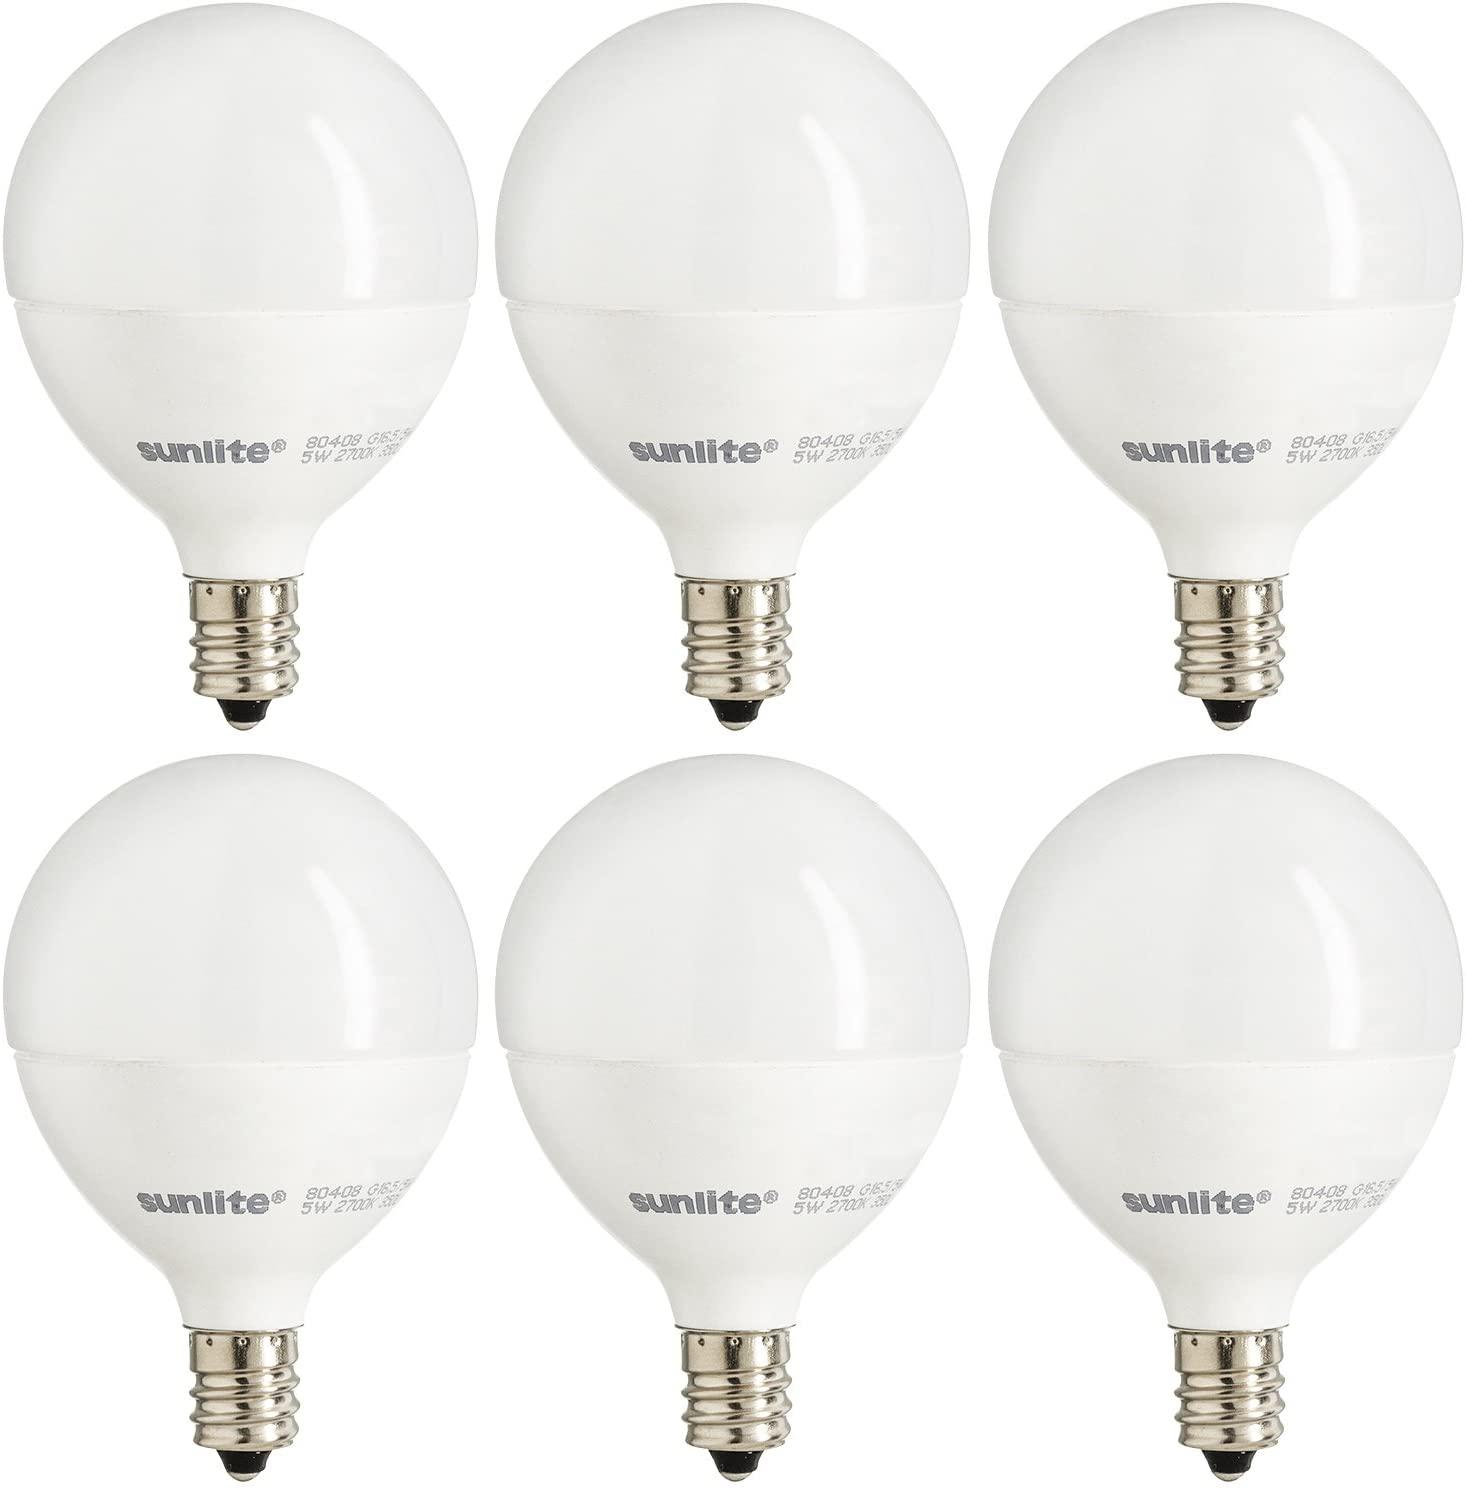 Sunlite G16.5/LED/7W/D/E12/FR/ES/27K/CD/6PK Bathroom Vanity E12 Candelabra Frost Dimmable Light Bulb (6 Pack), 60 Equivalent, 6 Count